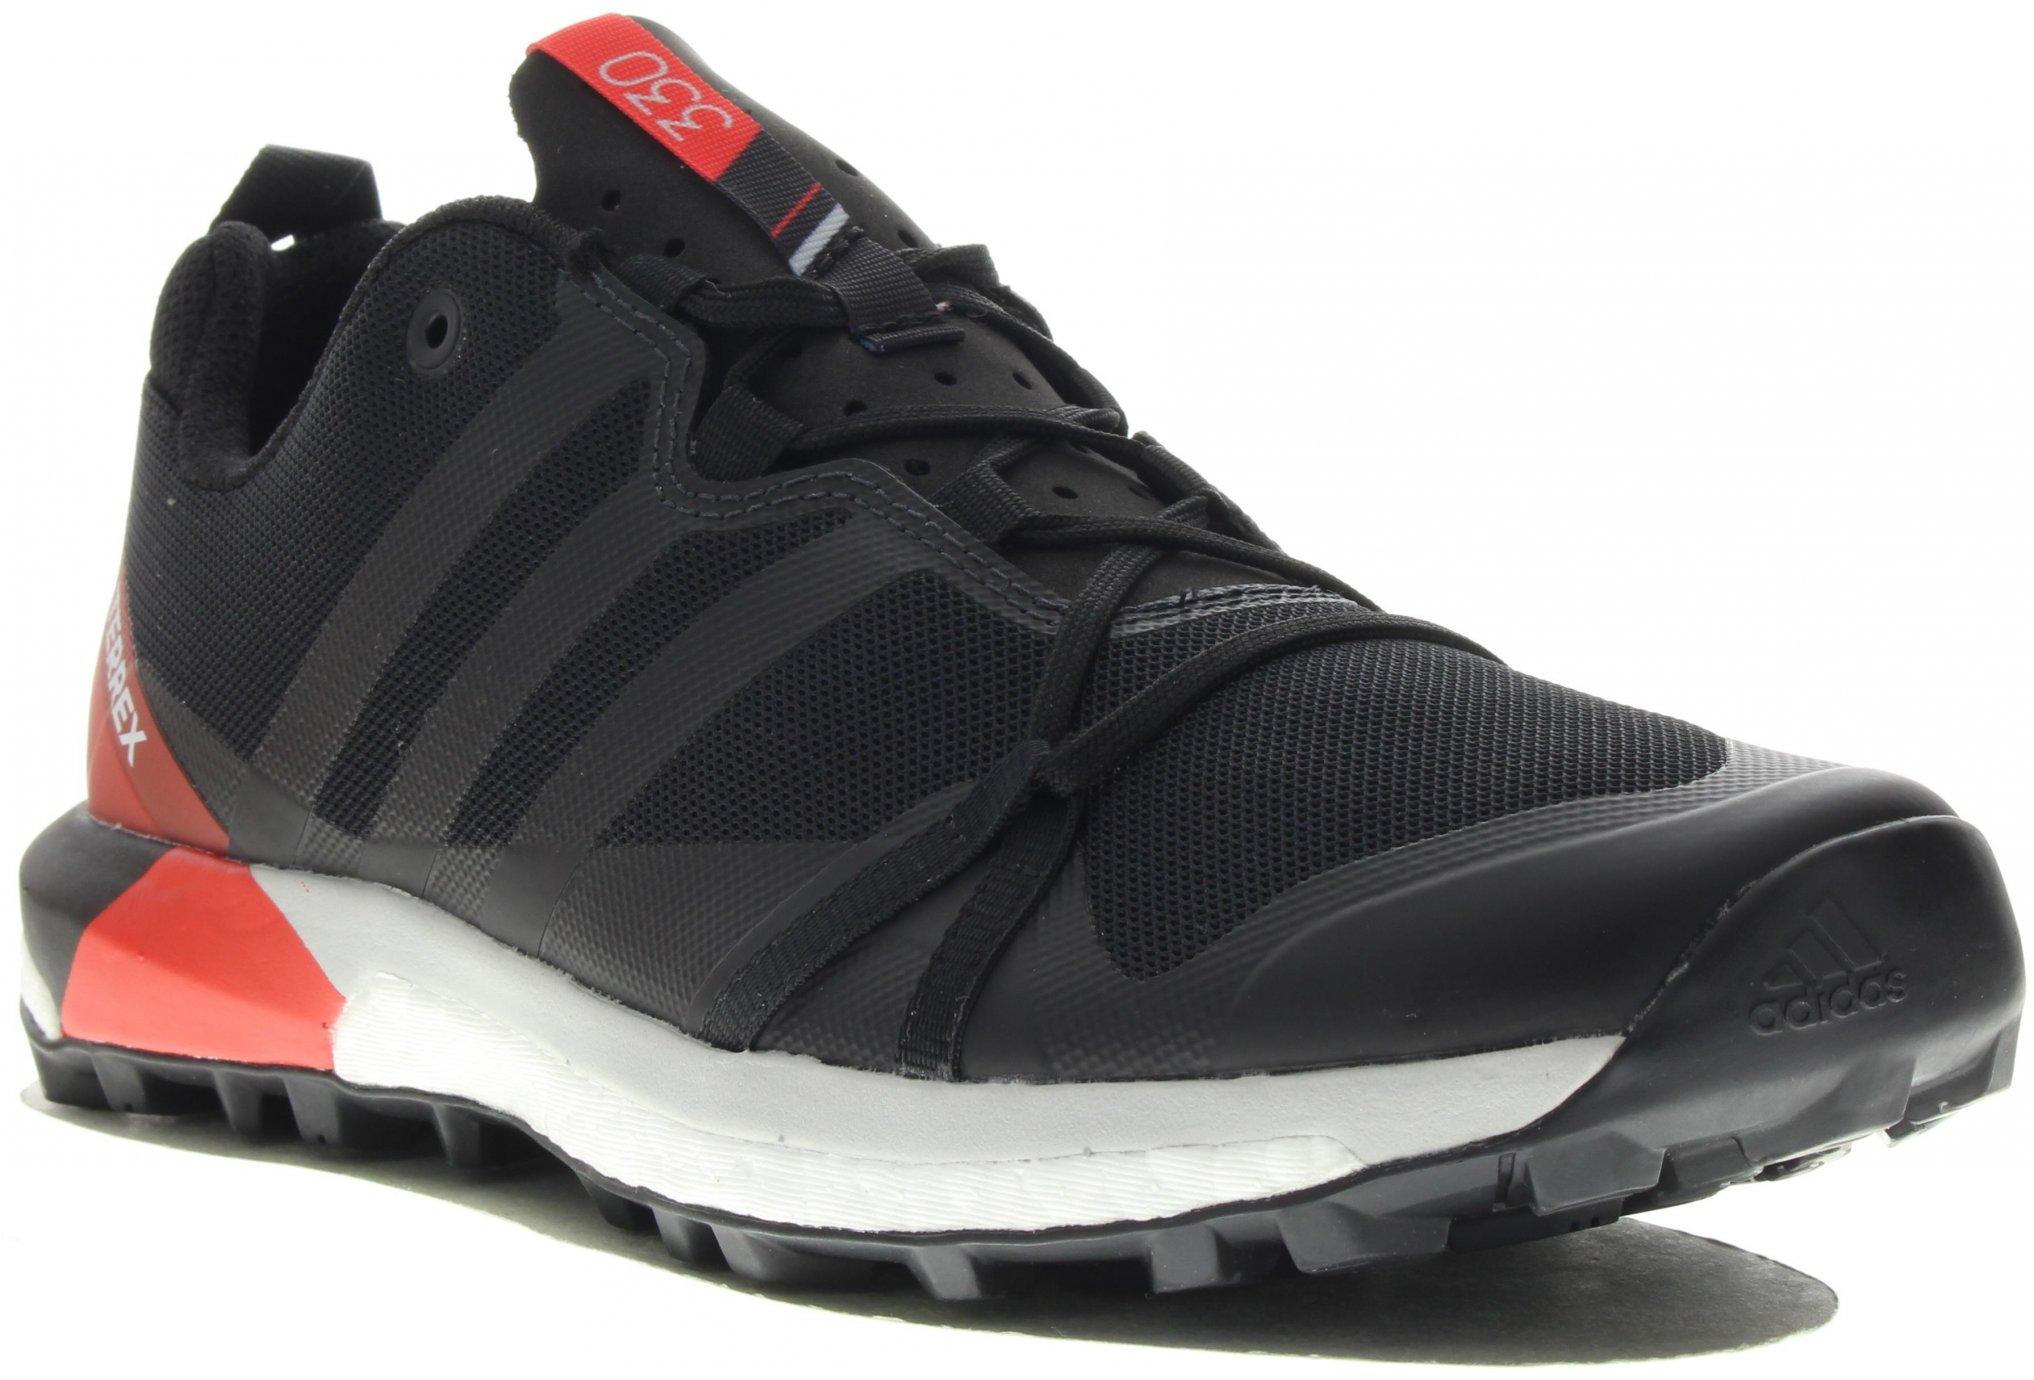 Adidas Trail Cqv6fz1wcx Adidas Cqv6fz1wcx Chaussures Cqv6fz1wcx Chaussures Trail Trail Adidas Chaussures Adidas Trail Chaussures QoxtBshrdC